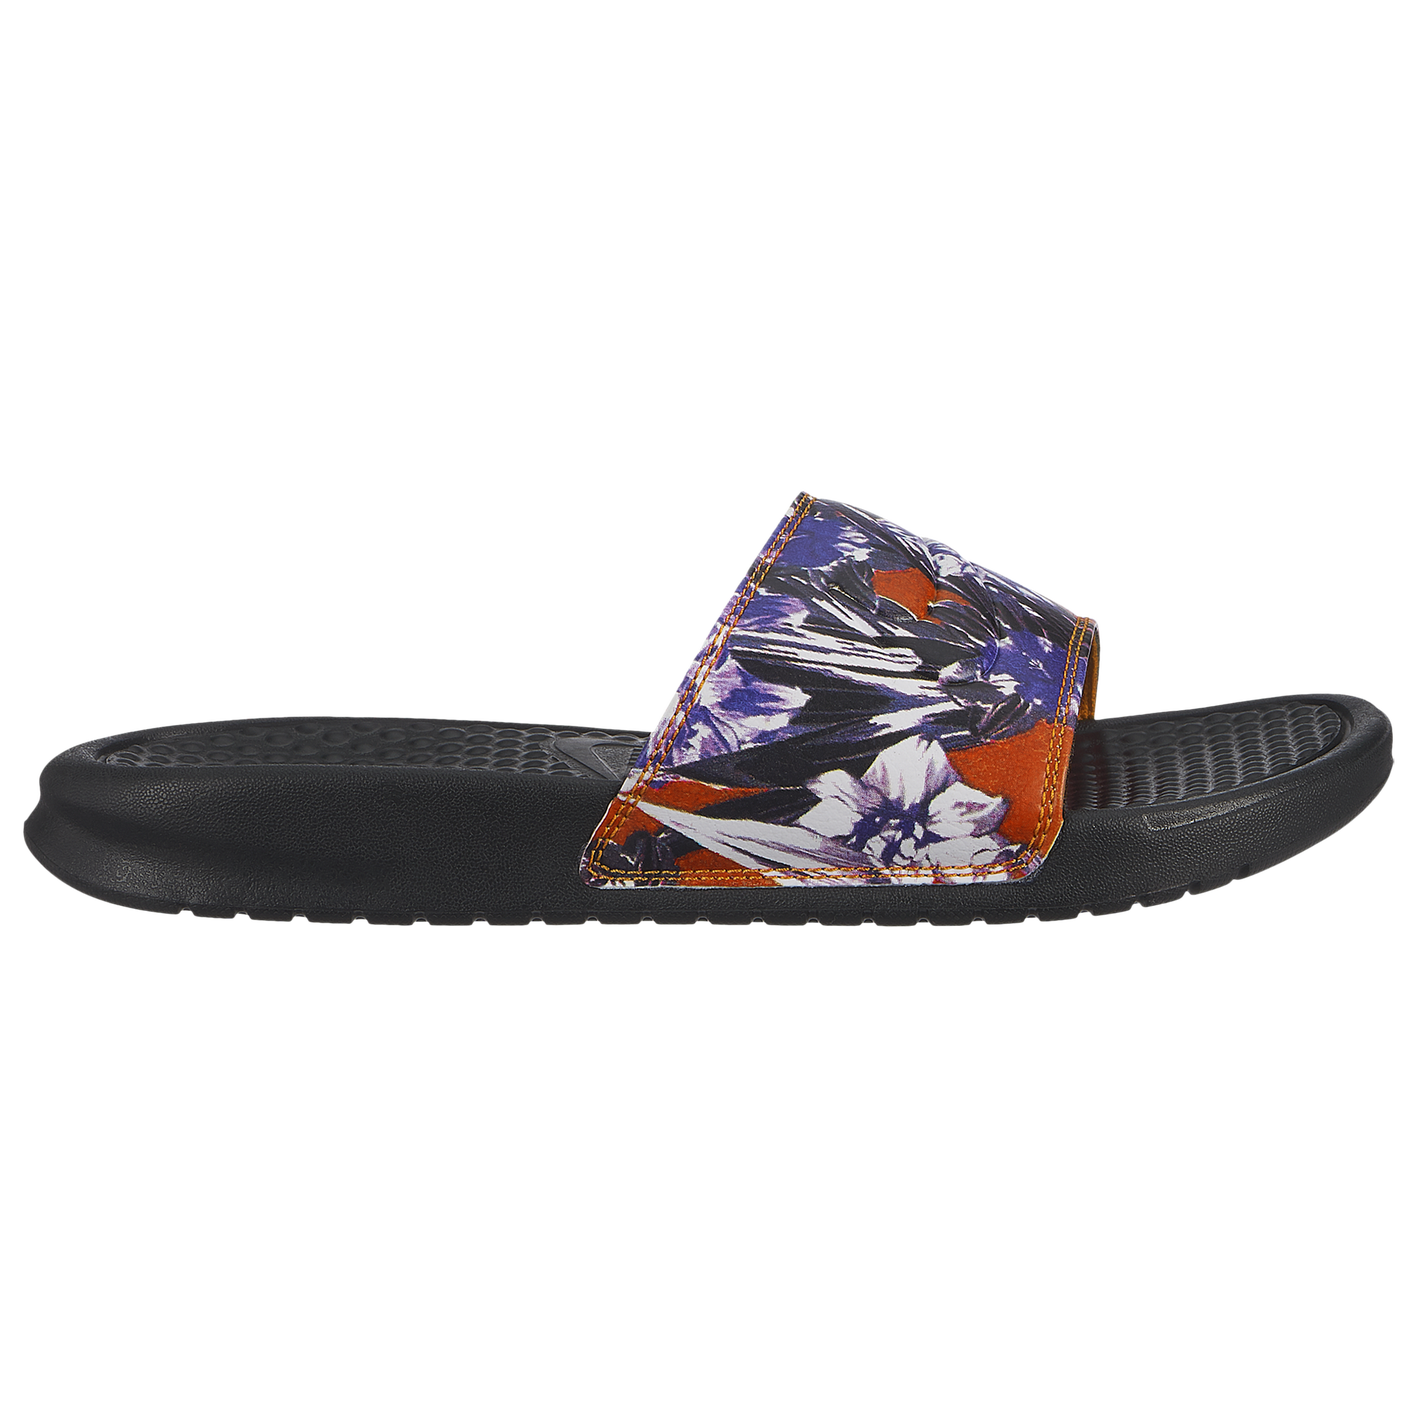 3f20da41845 Nike Benassi JDI Slide - Women s - Casual - Shoes - Black Team Orange